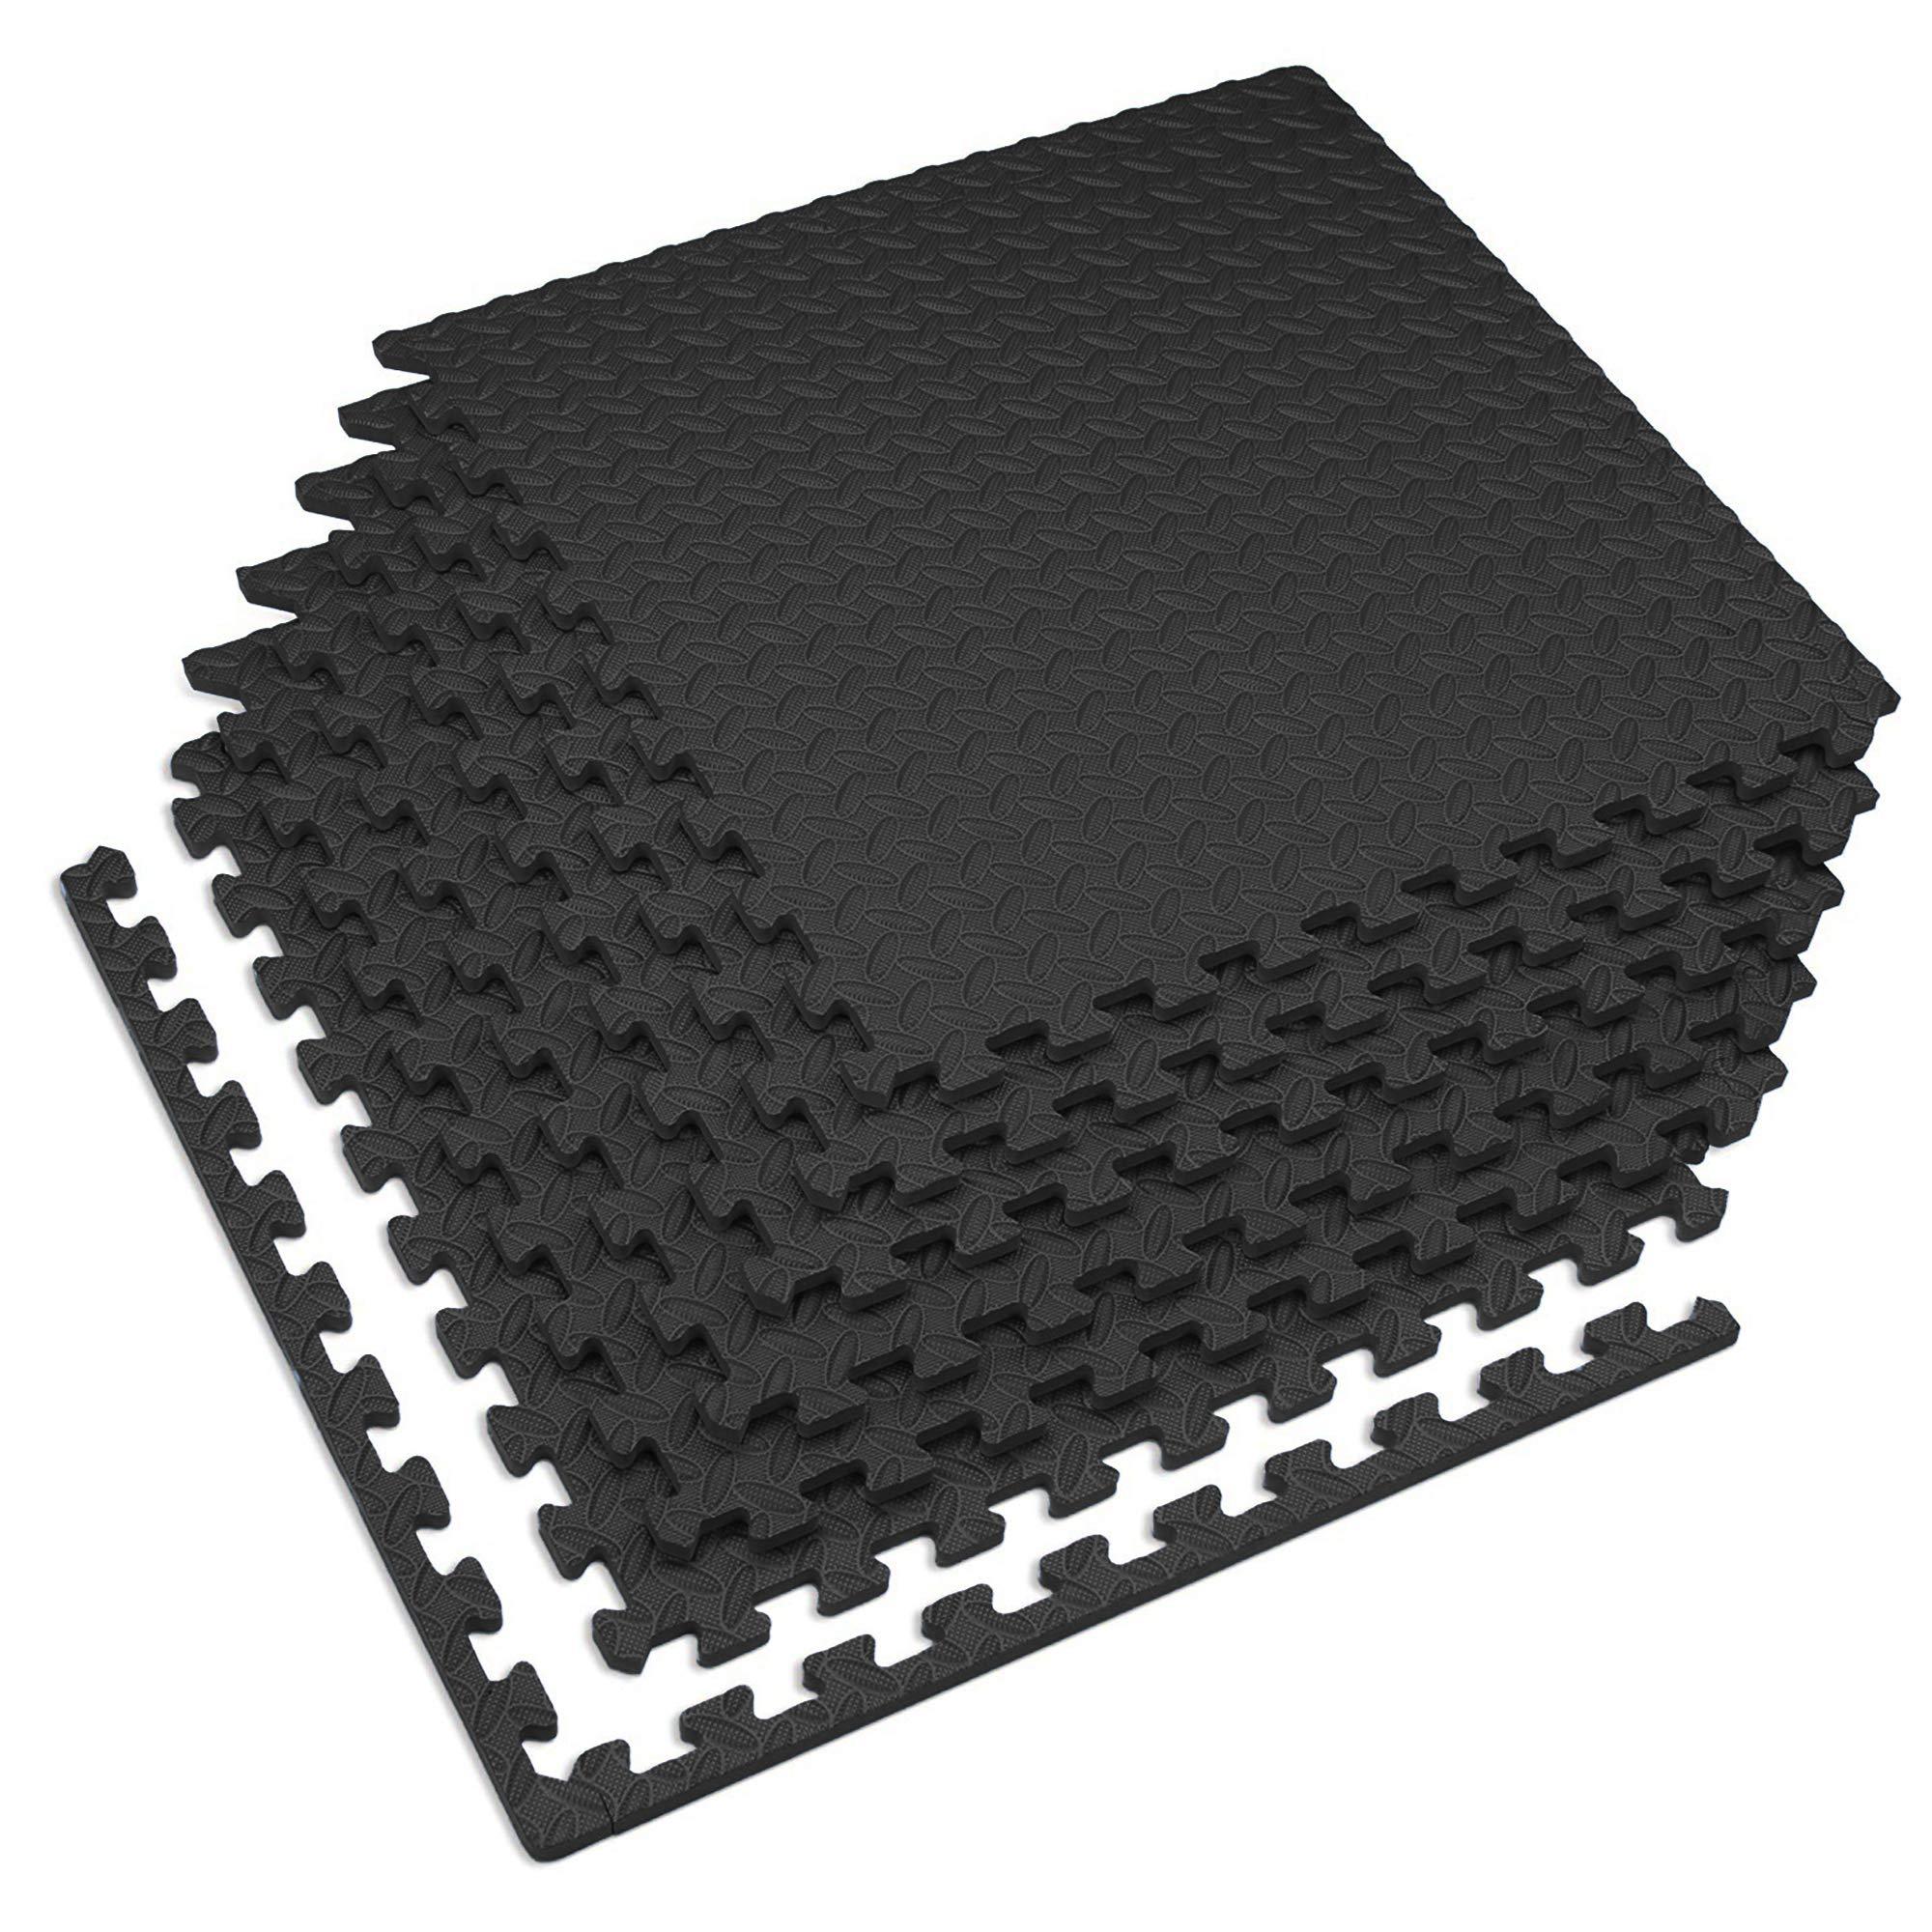 Velotas Thick Interlocking (6 Tiles) Foam Fitness Mat, 24 sq. ft, Black